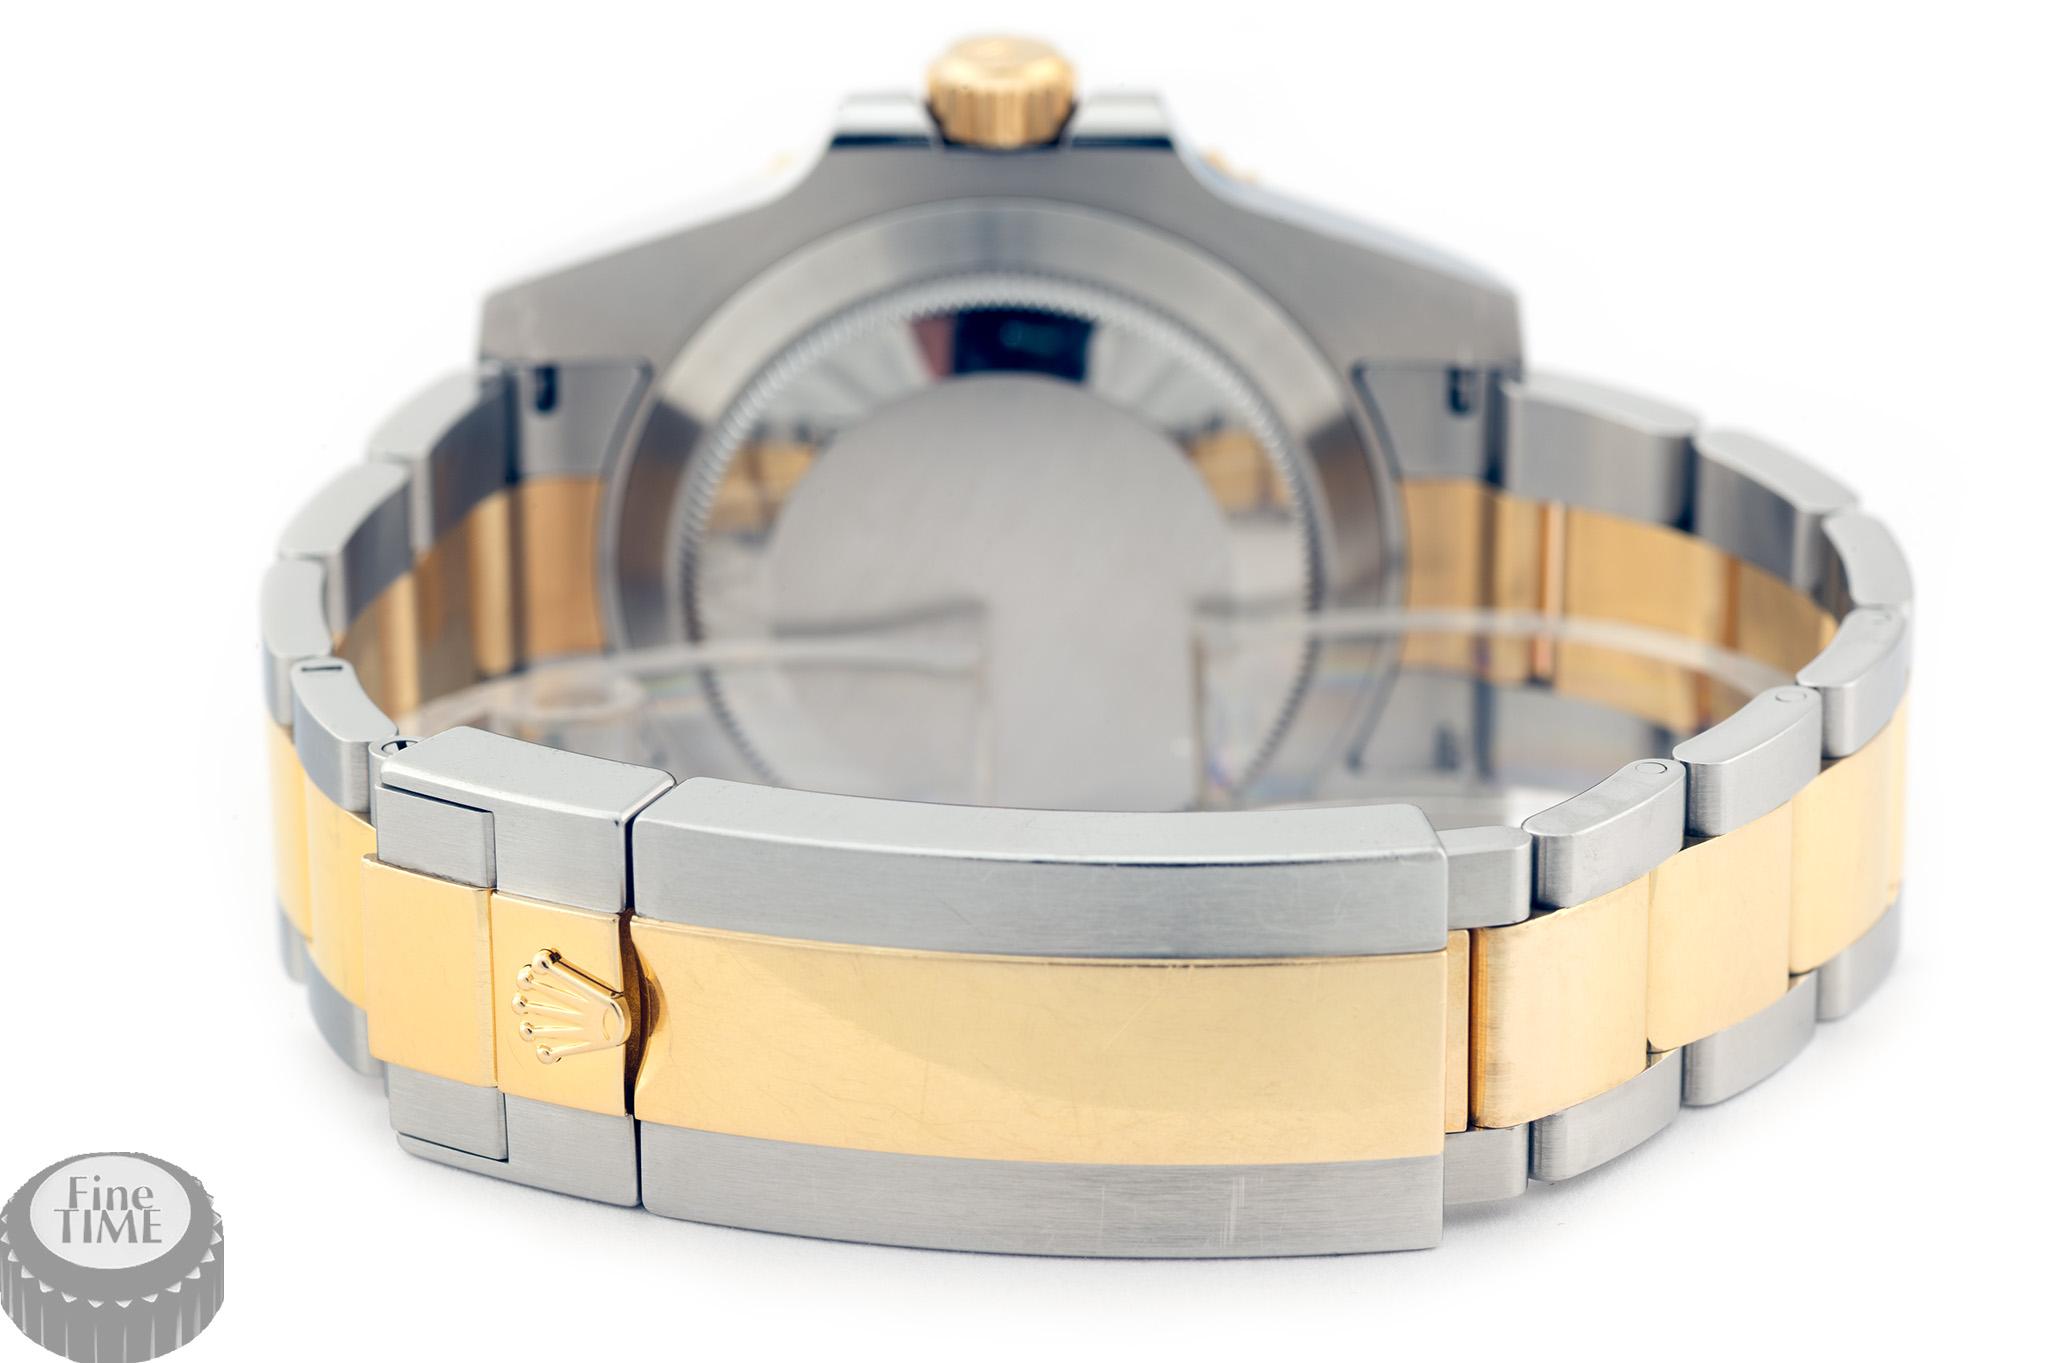 Rolex Oyster steel/gold bracelet